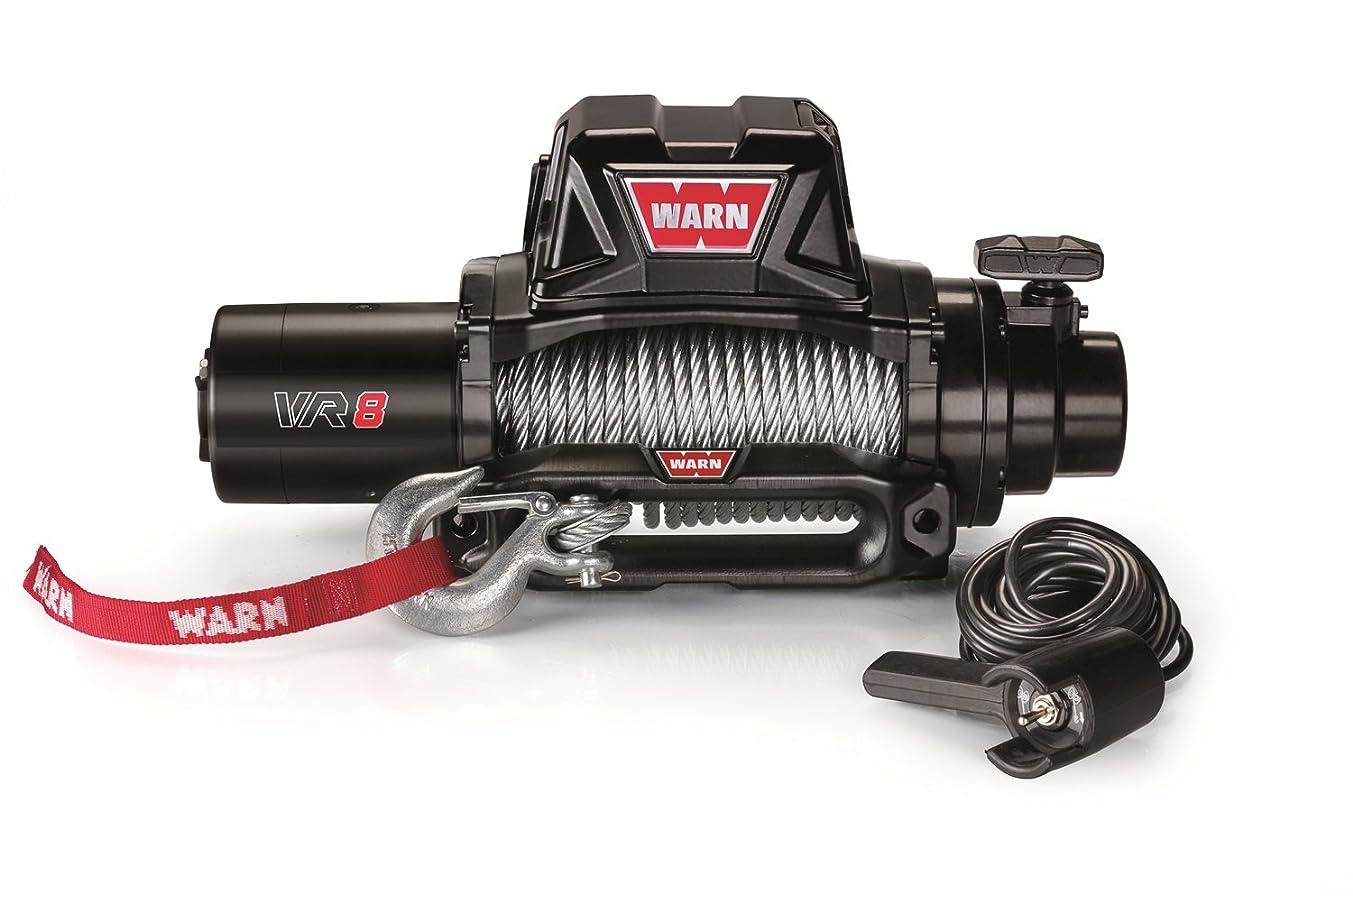 WARN 96800 8000 lb. VR8 Winch